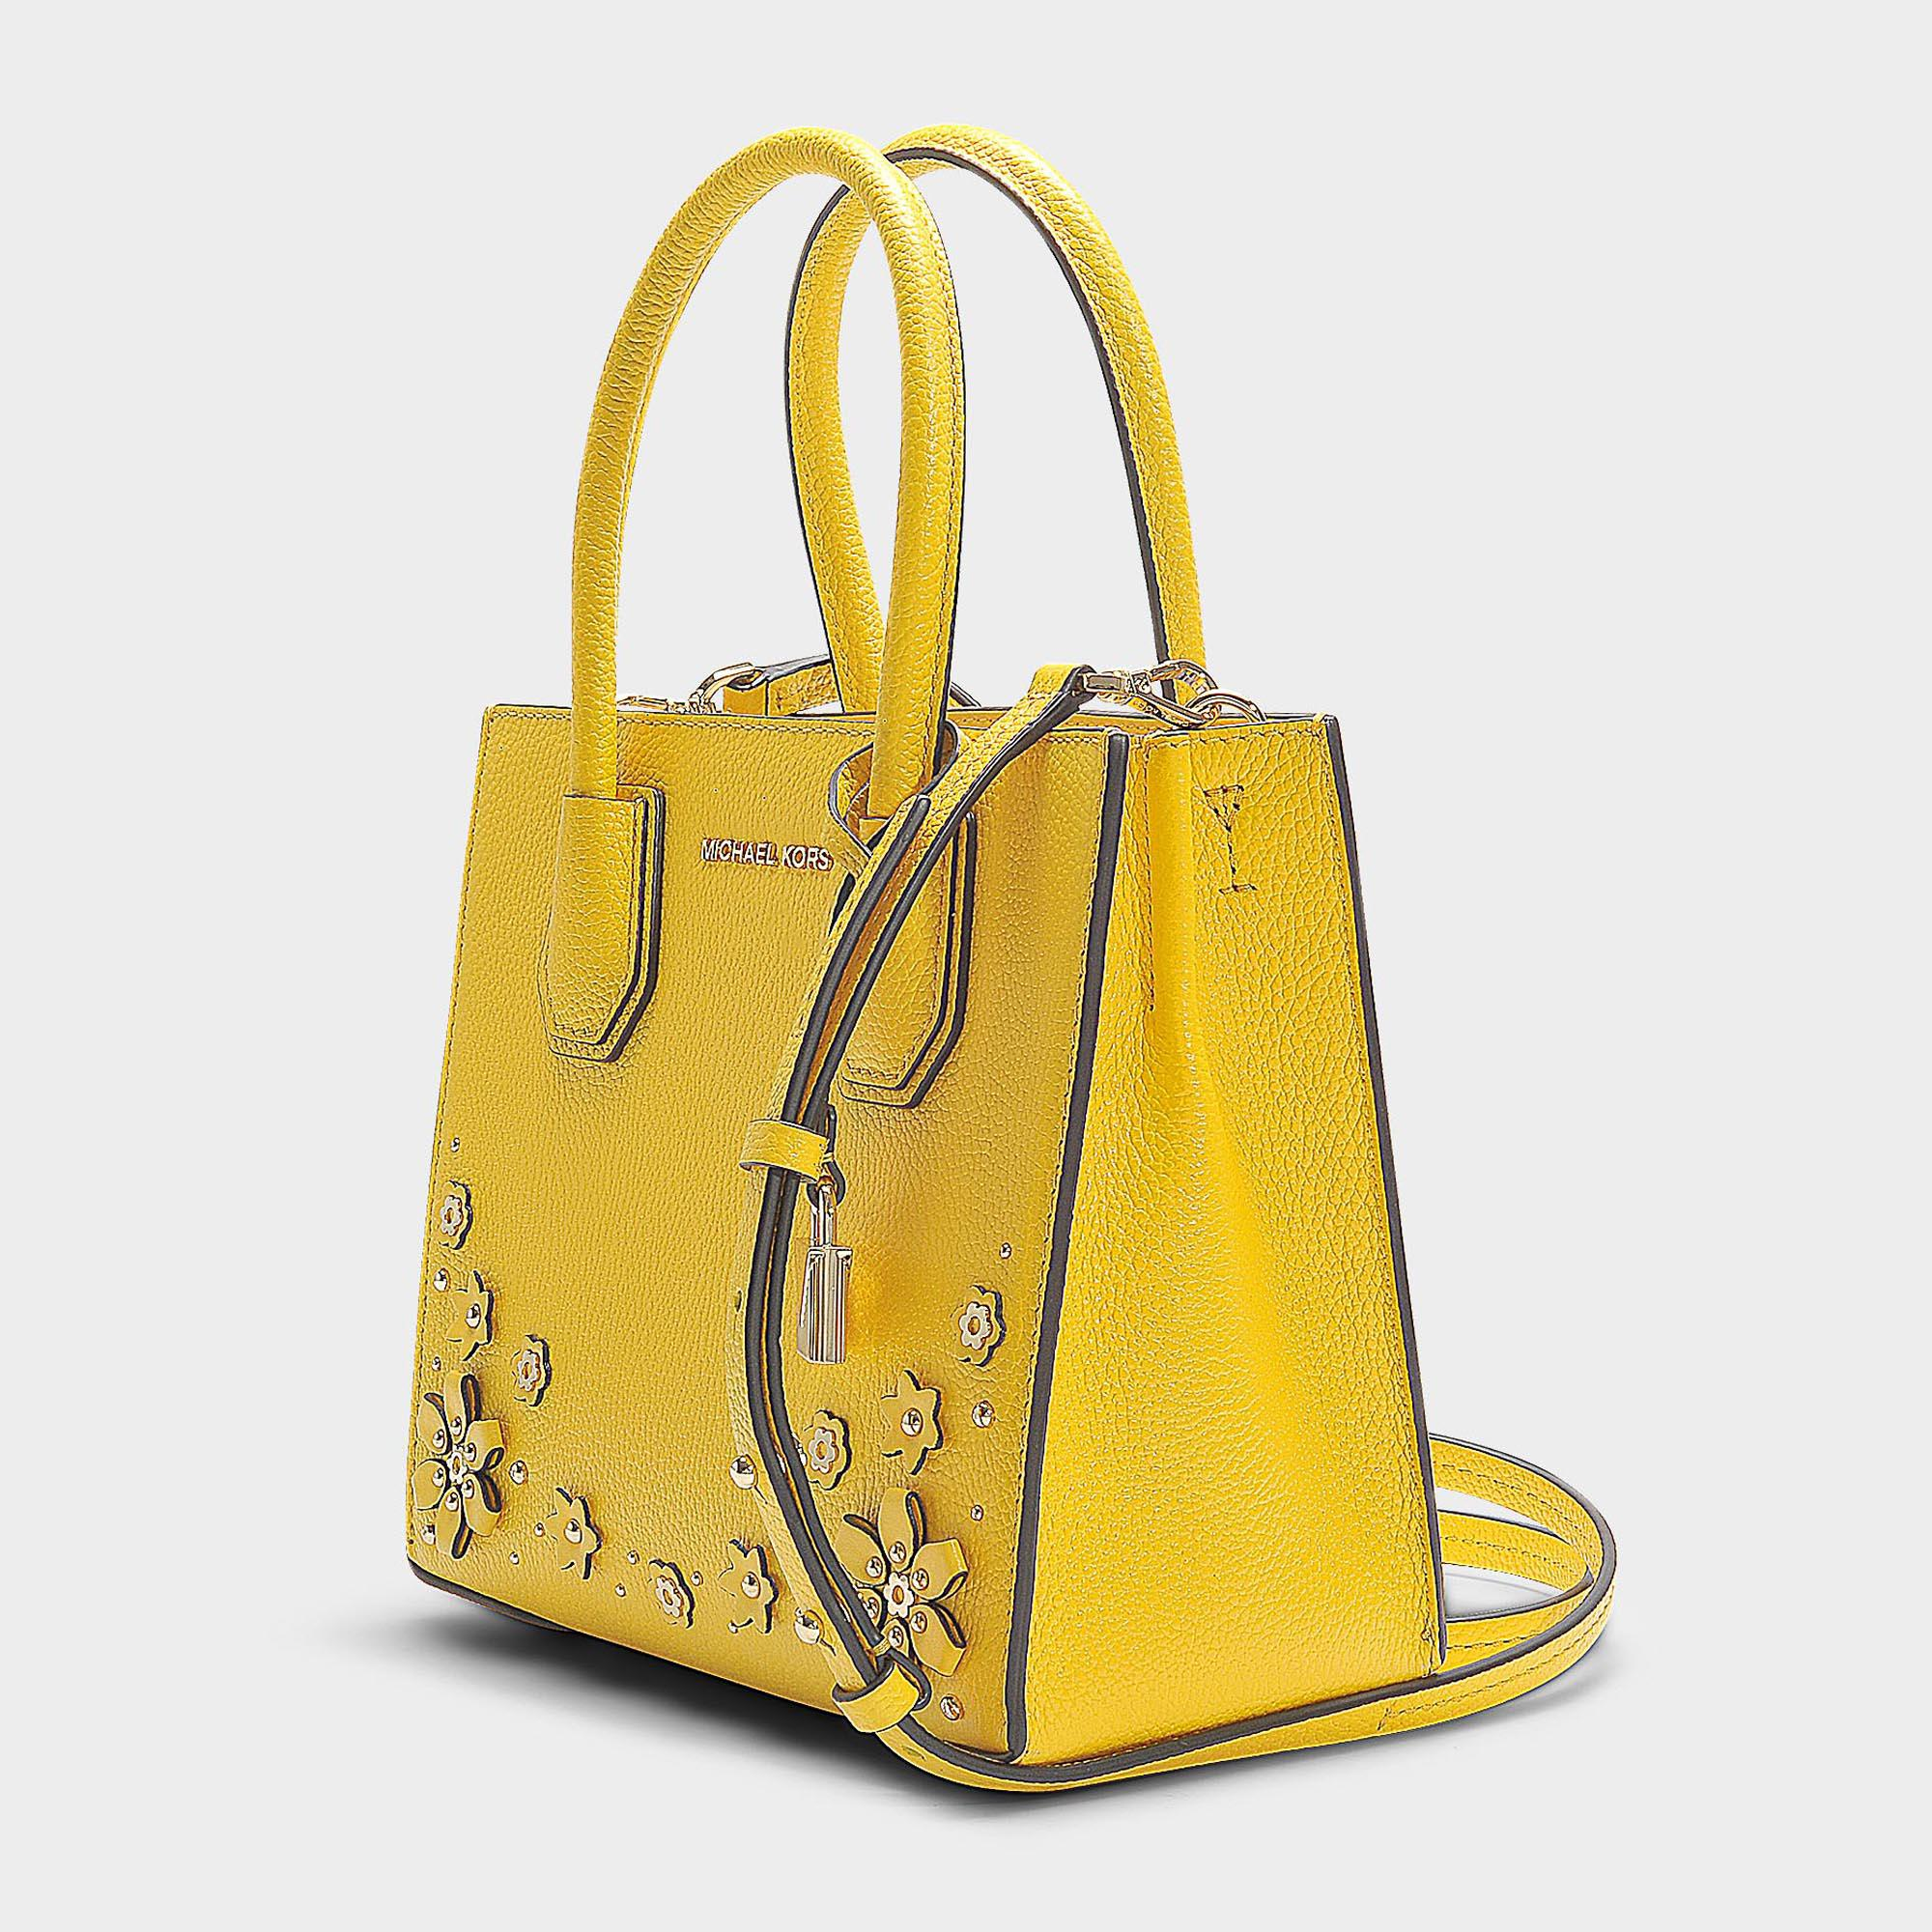 9af0301485db MICHAEL Michael Kors Mercer Medium Messenger Bag In Sunflower ...